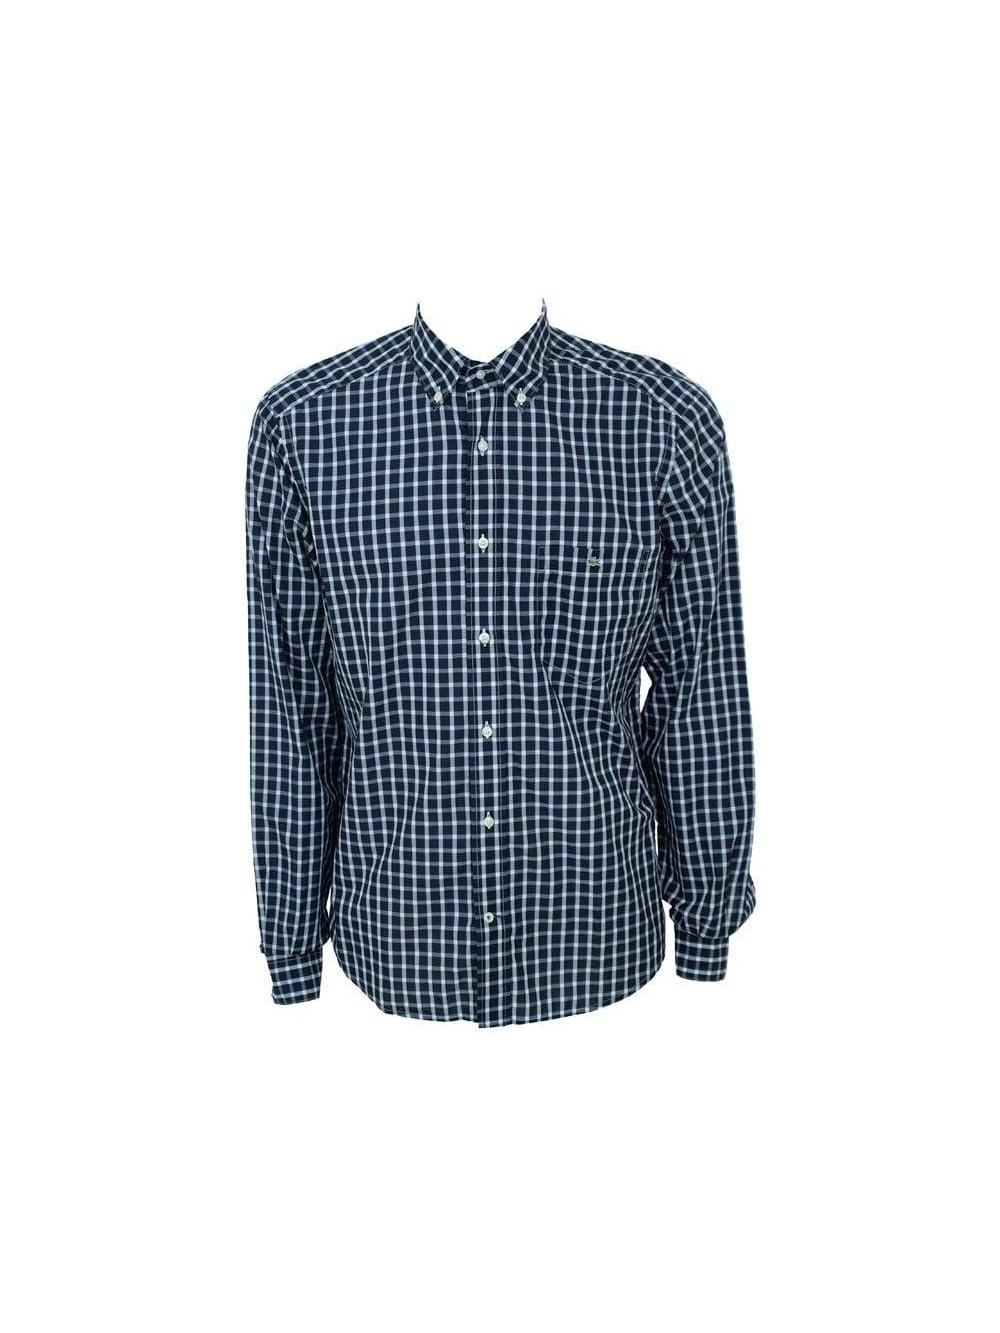 a6f73ffd18a3e Lacoste - Lacoste Gap Check Shirt - Dark Navy - Mens Designer Shirts ...